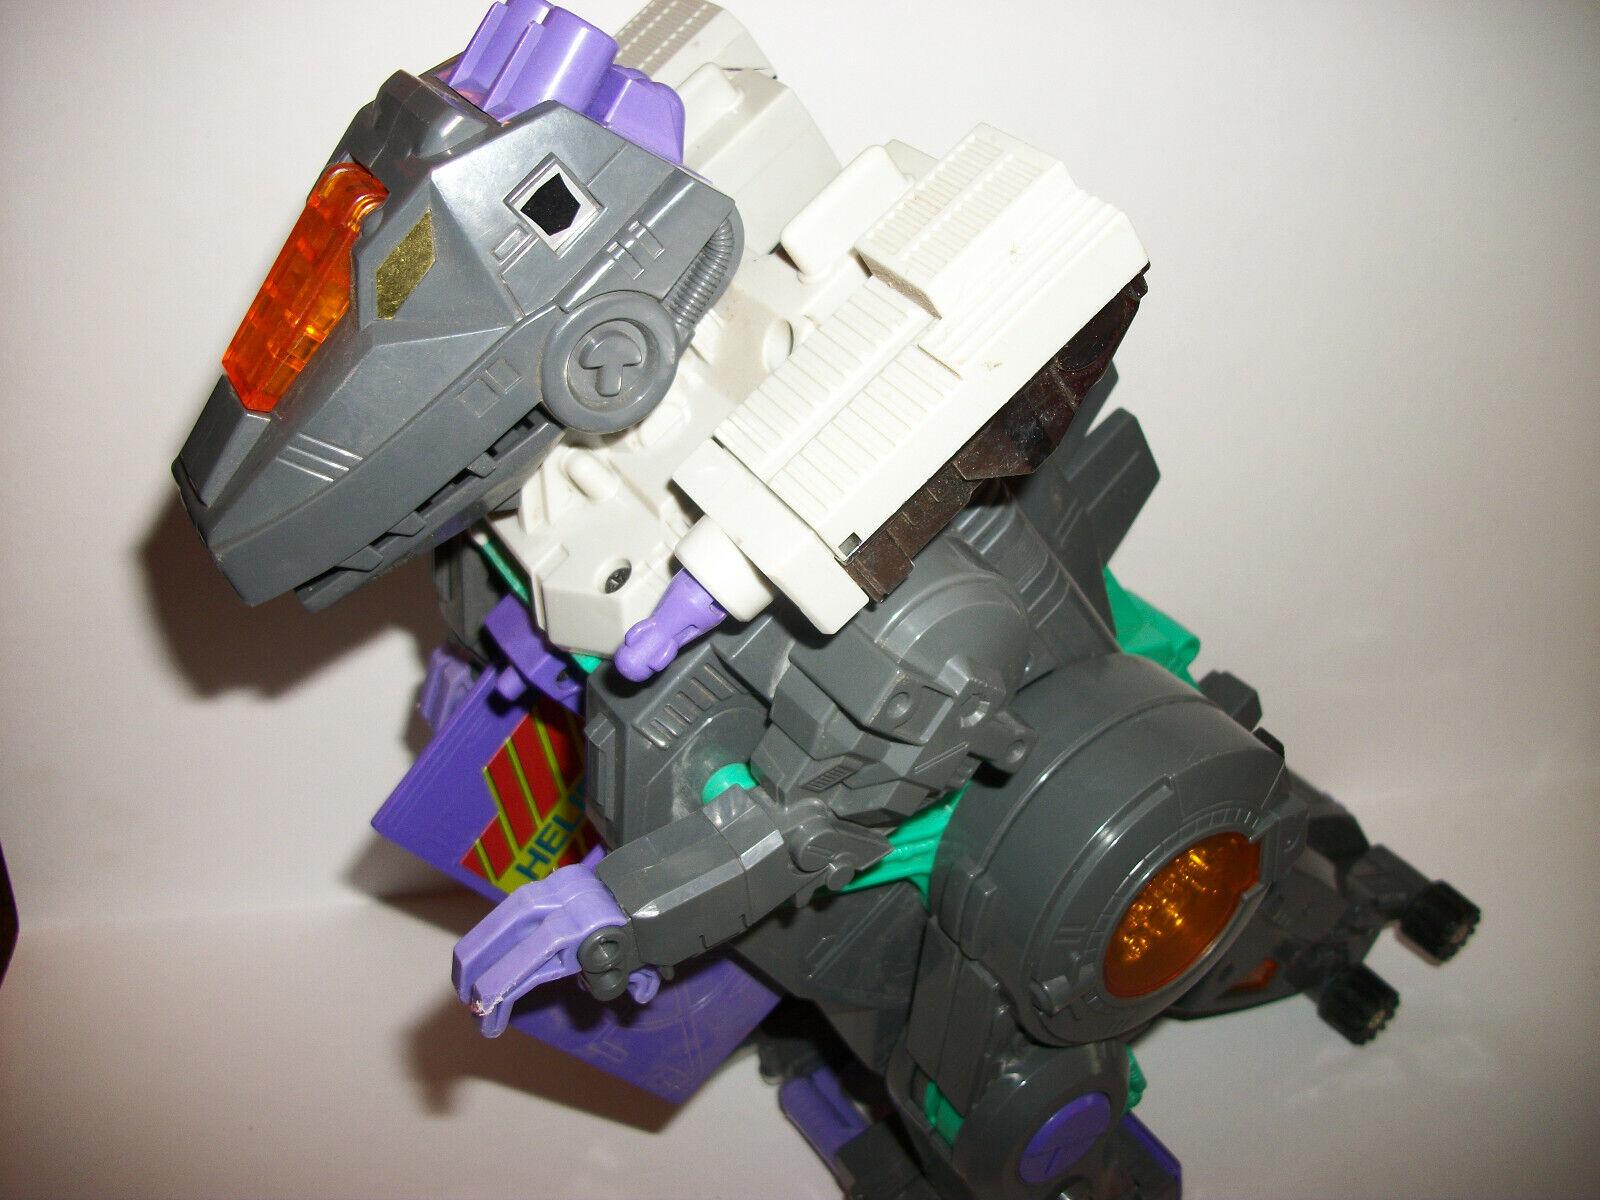 Transformers G1 G1 G1 Hasbro Original Trypticon T-Rex 3e1e4d